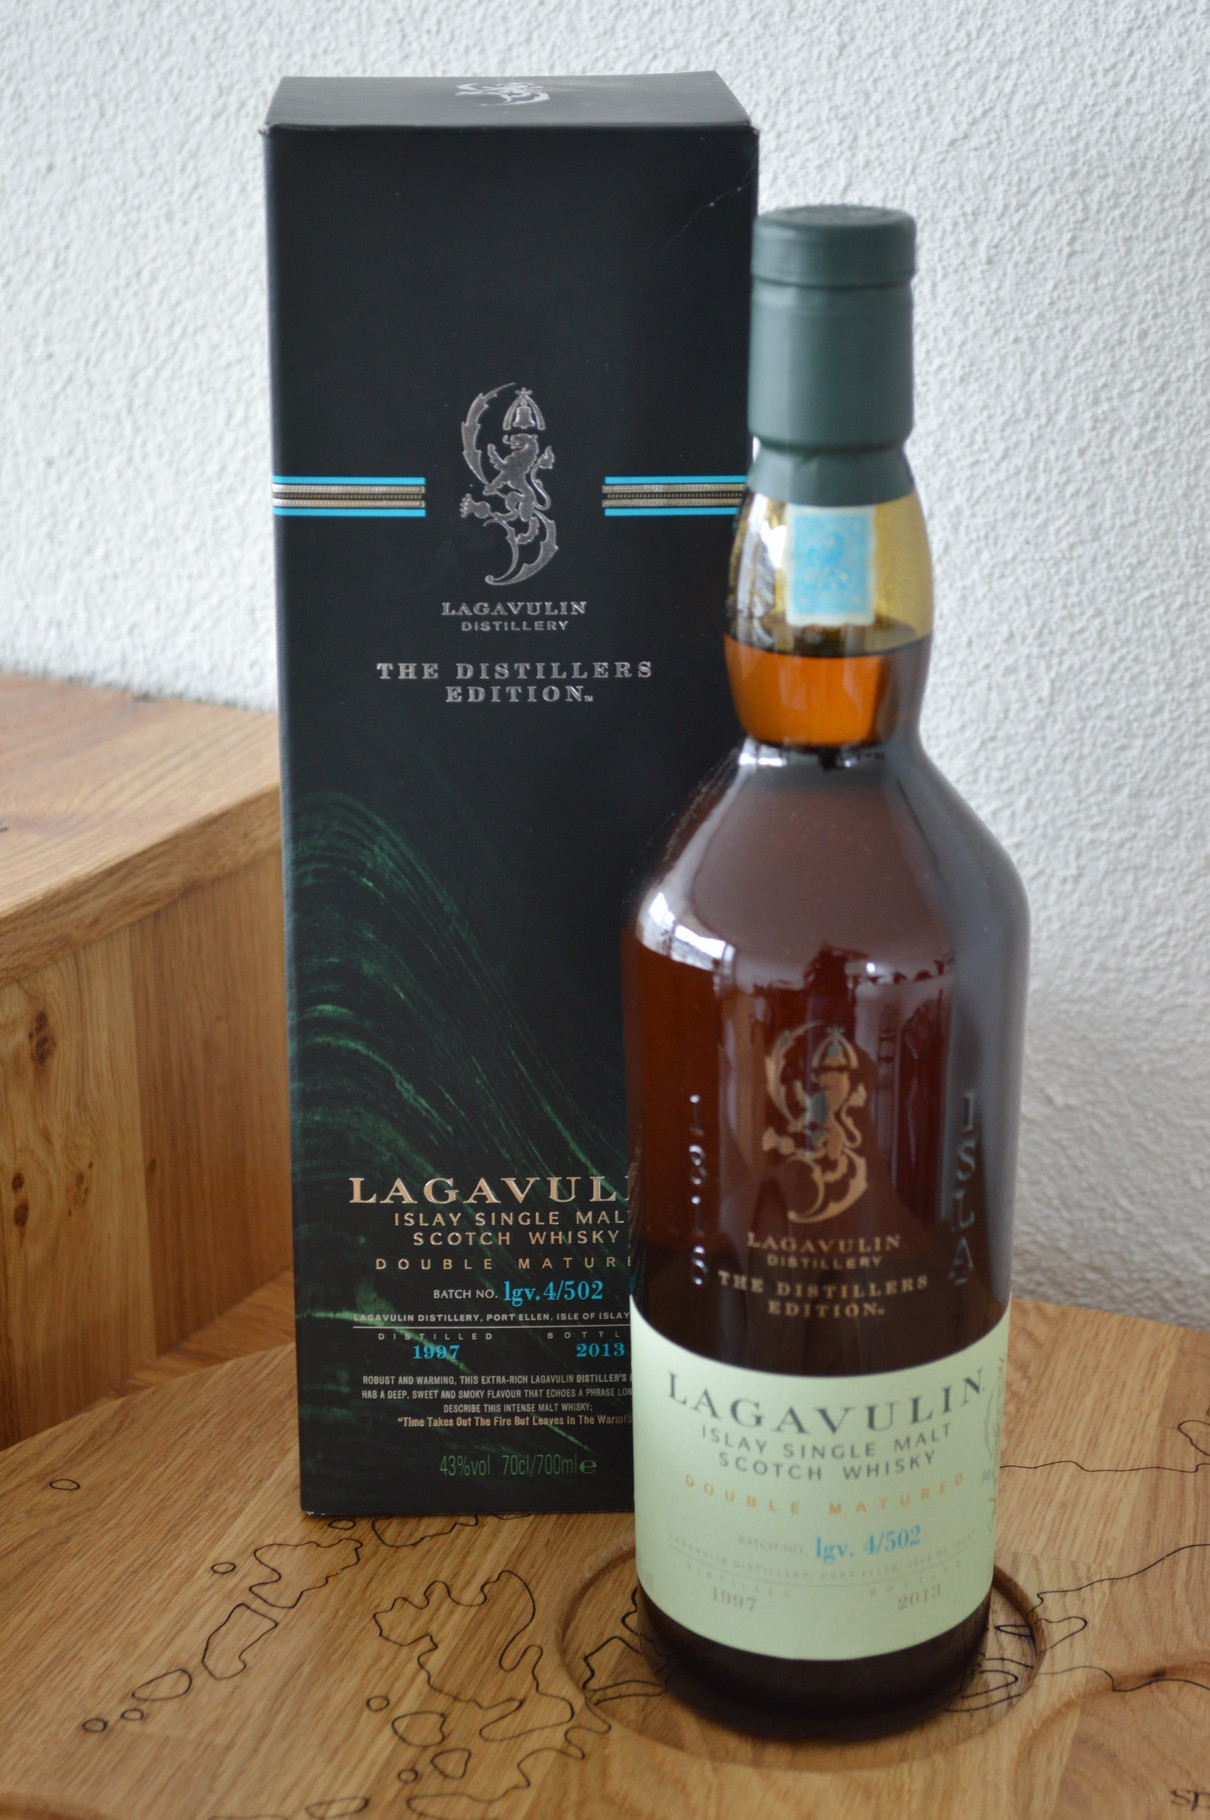 ISLAY - Lagavulin - Aged: 16 - Bottler: Original - 70cl - 43% - The Distillers Edition